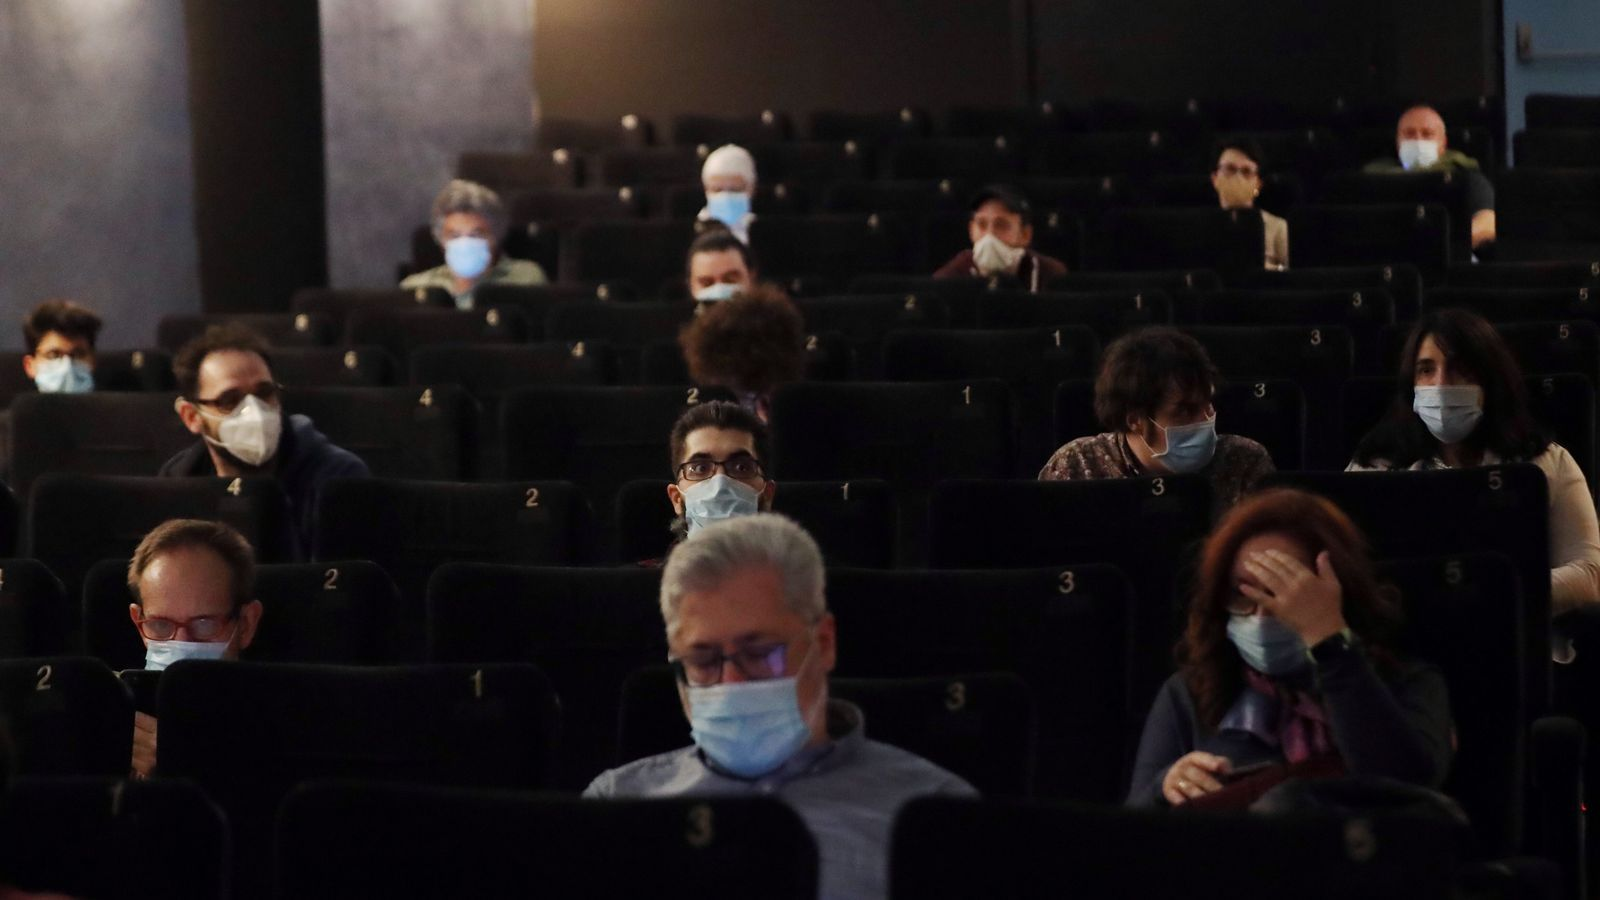 Espectadors al cinema Renoir de Madrid